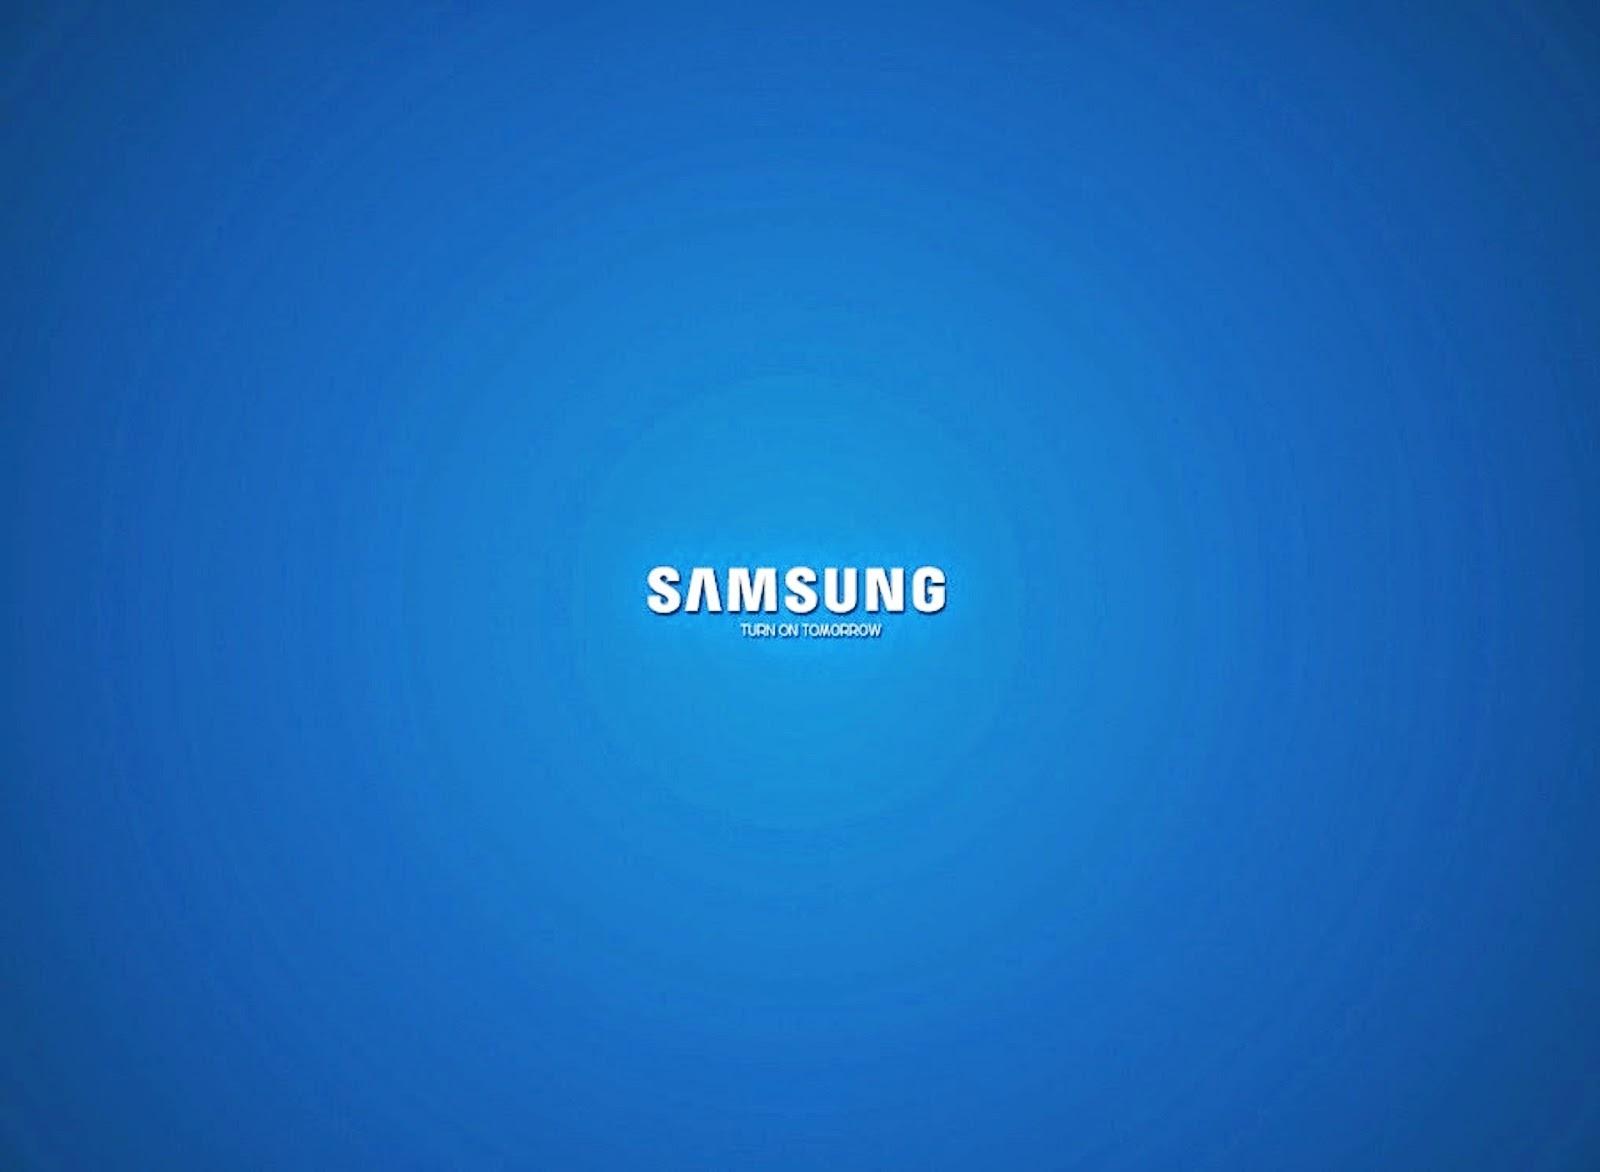 Samsung Galaxy A Wallpaper Free Download Samsung 1600x1172 Wallpaper Teahub Io